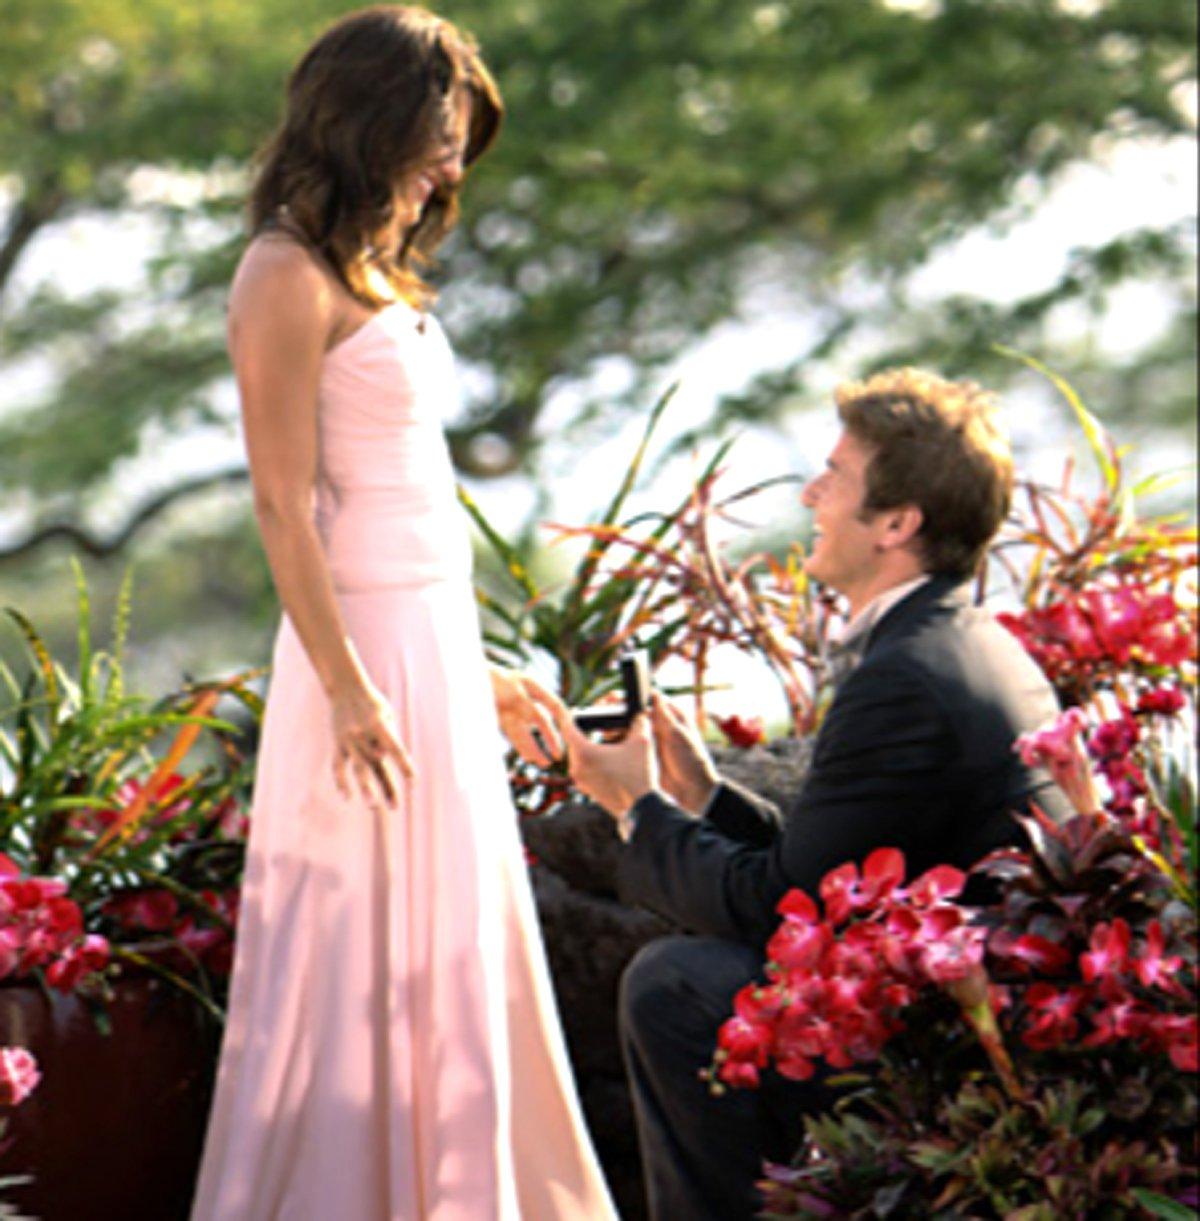 The Bachelorette Reid proposes to Jillian ABC